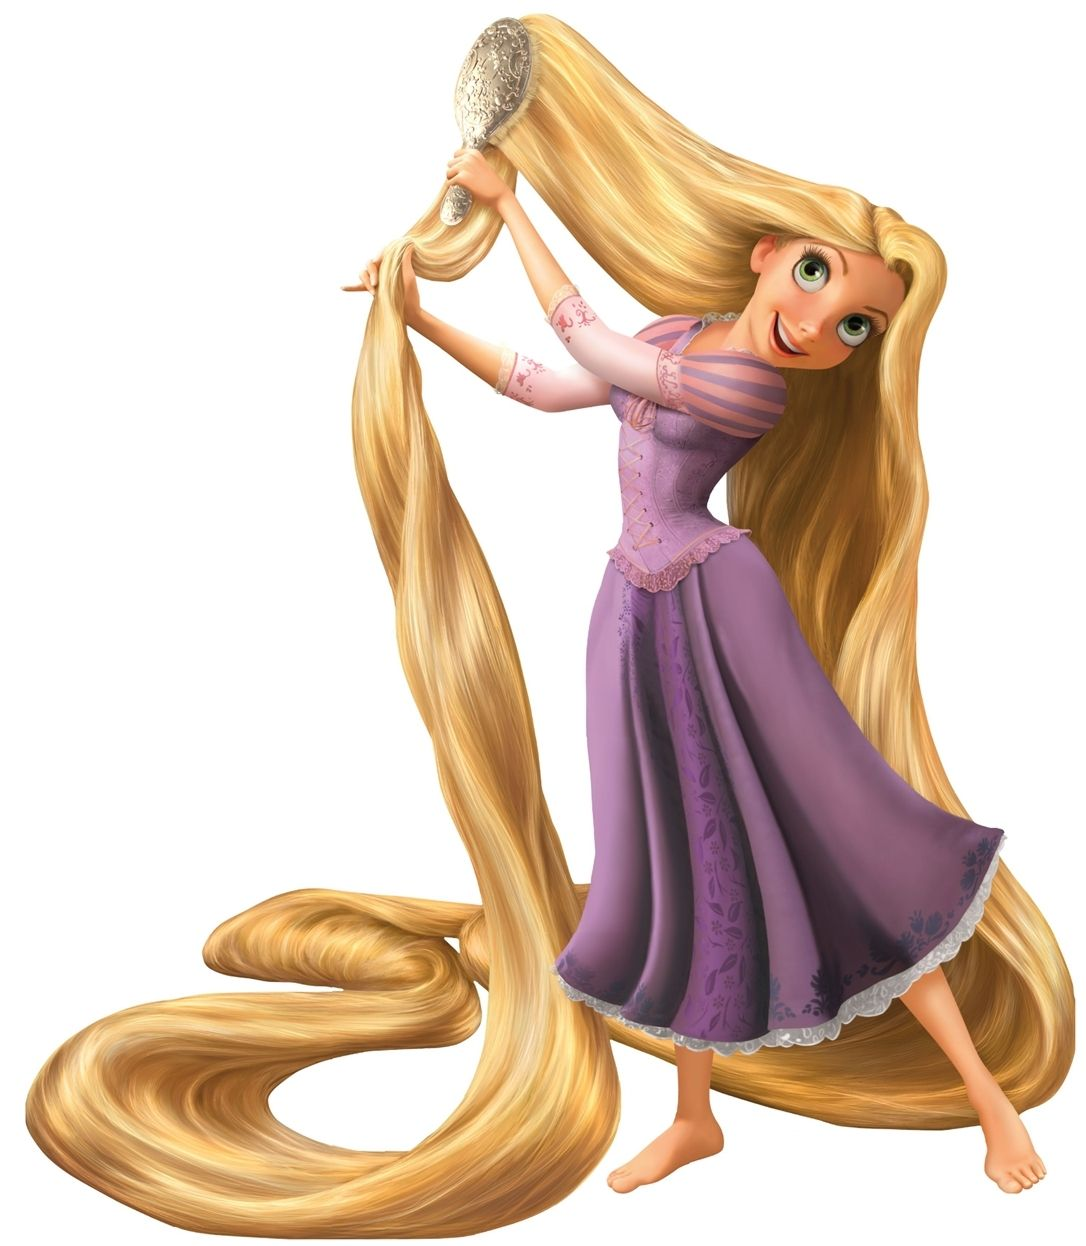 Rapunzel gallery rapunzel tangled and dreamworks - Nachtlicht disney princess ...